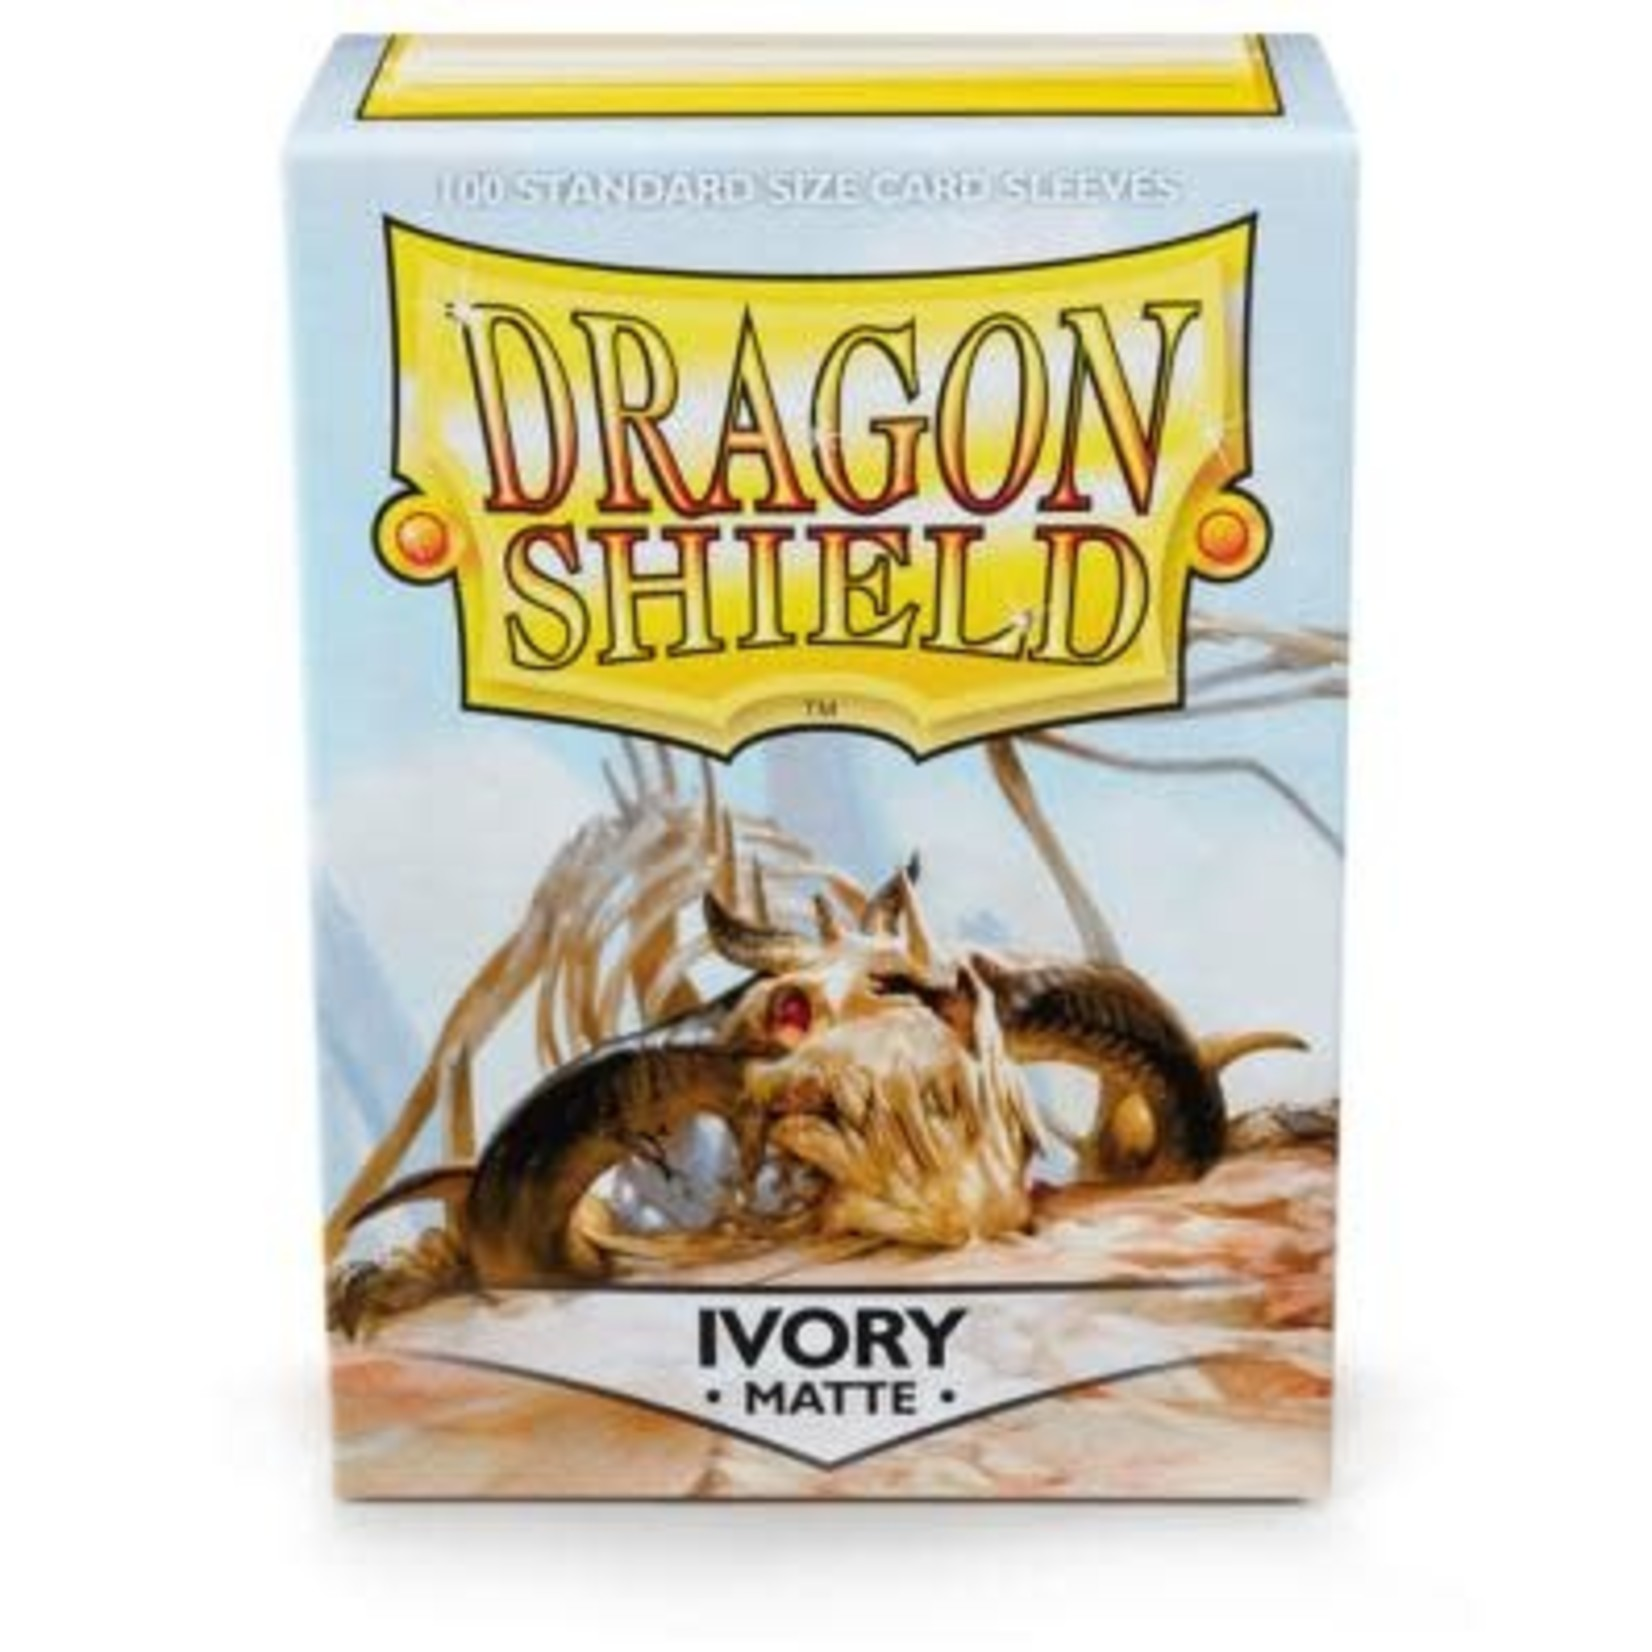 Arcane Tinman Dragon Shields: Cards Sleeves - Ivory Matte (100)